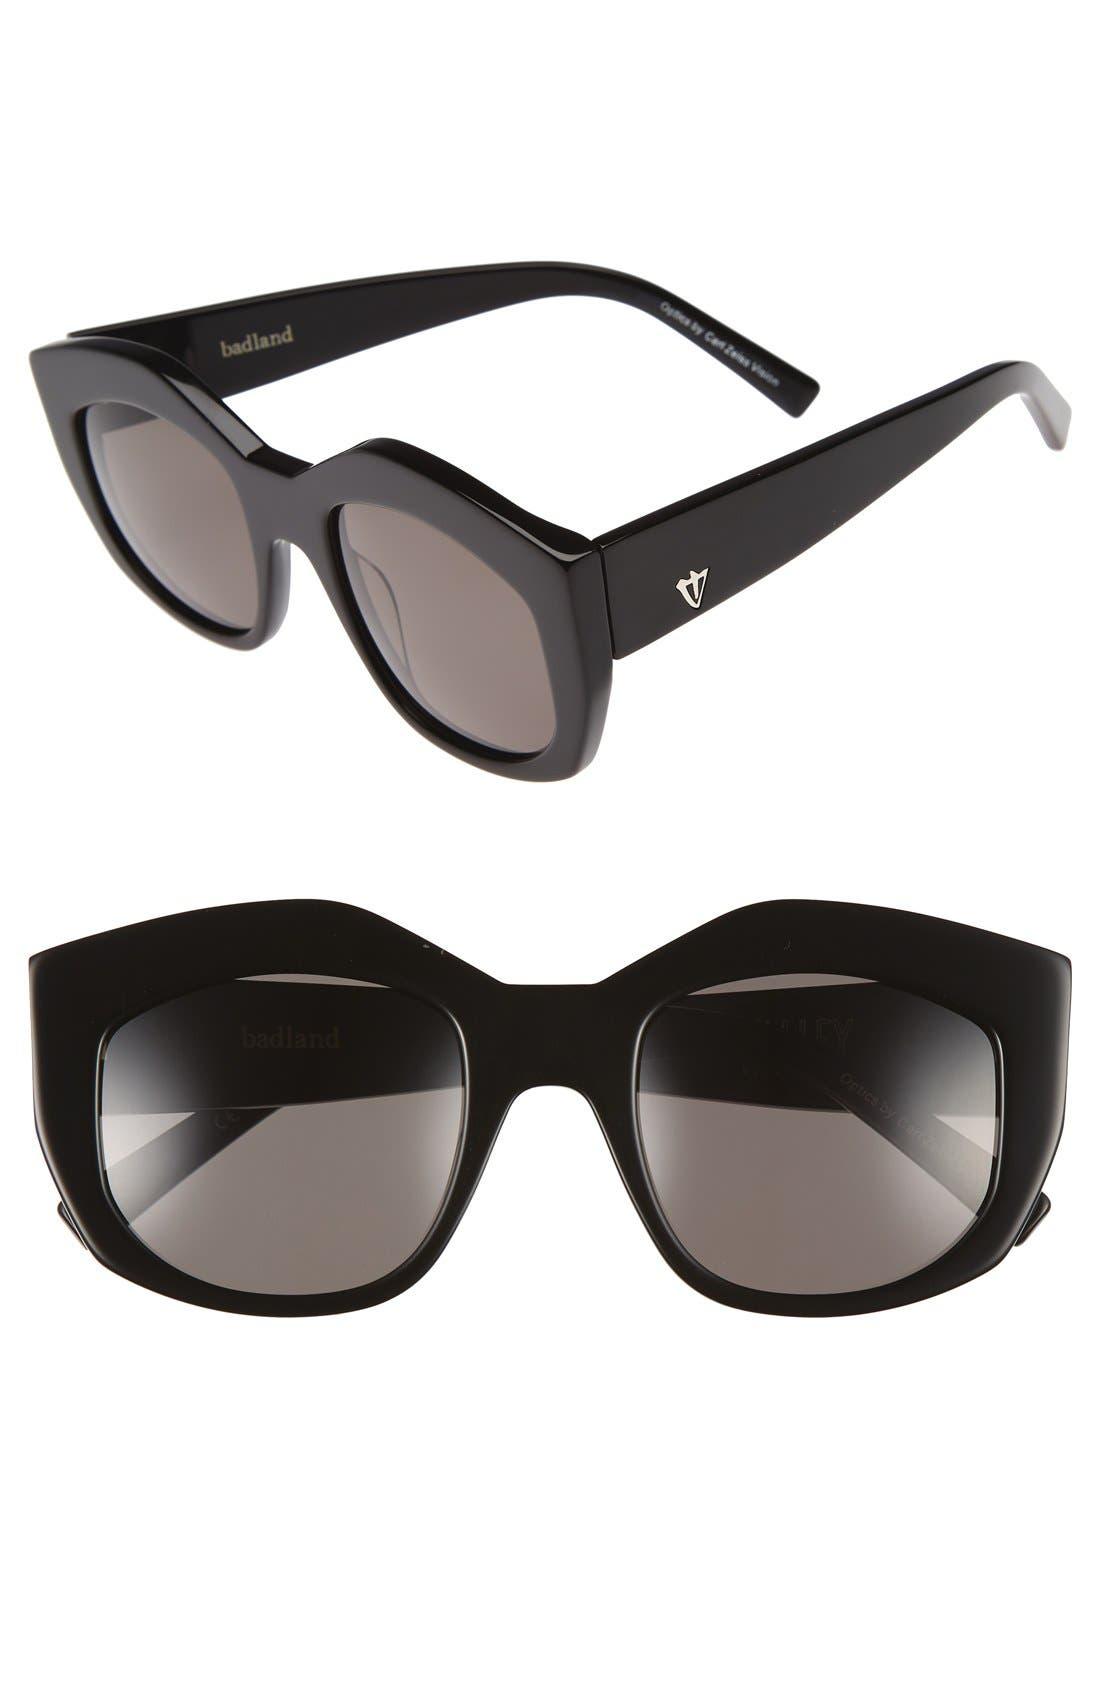 50mm Badland Sunglasses,                         Main,                         color, 001